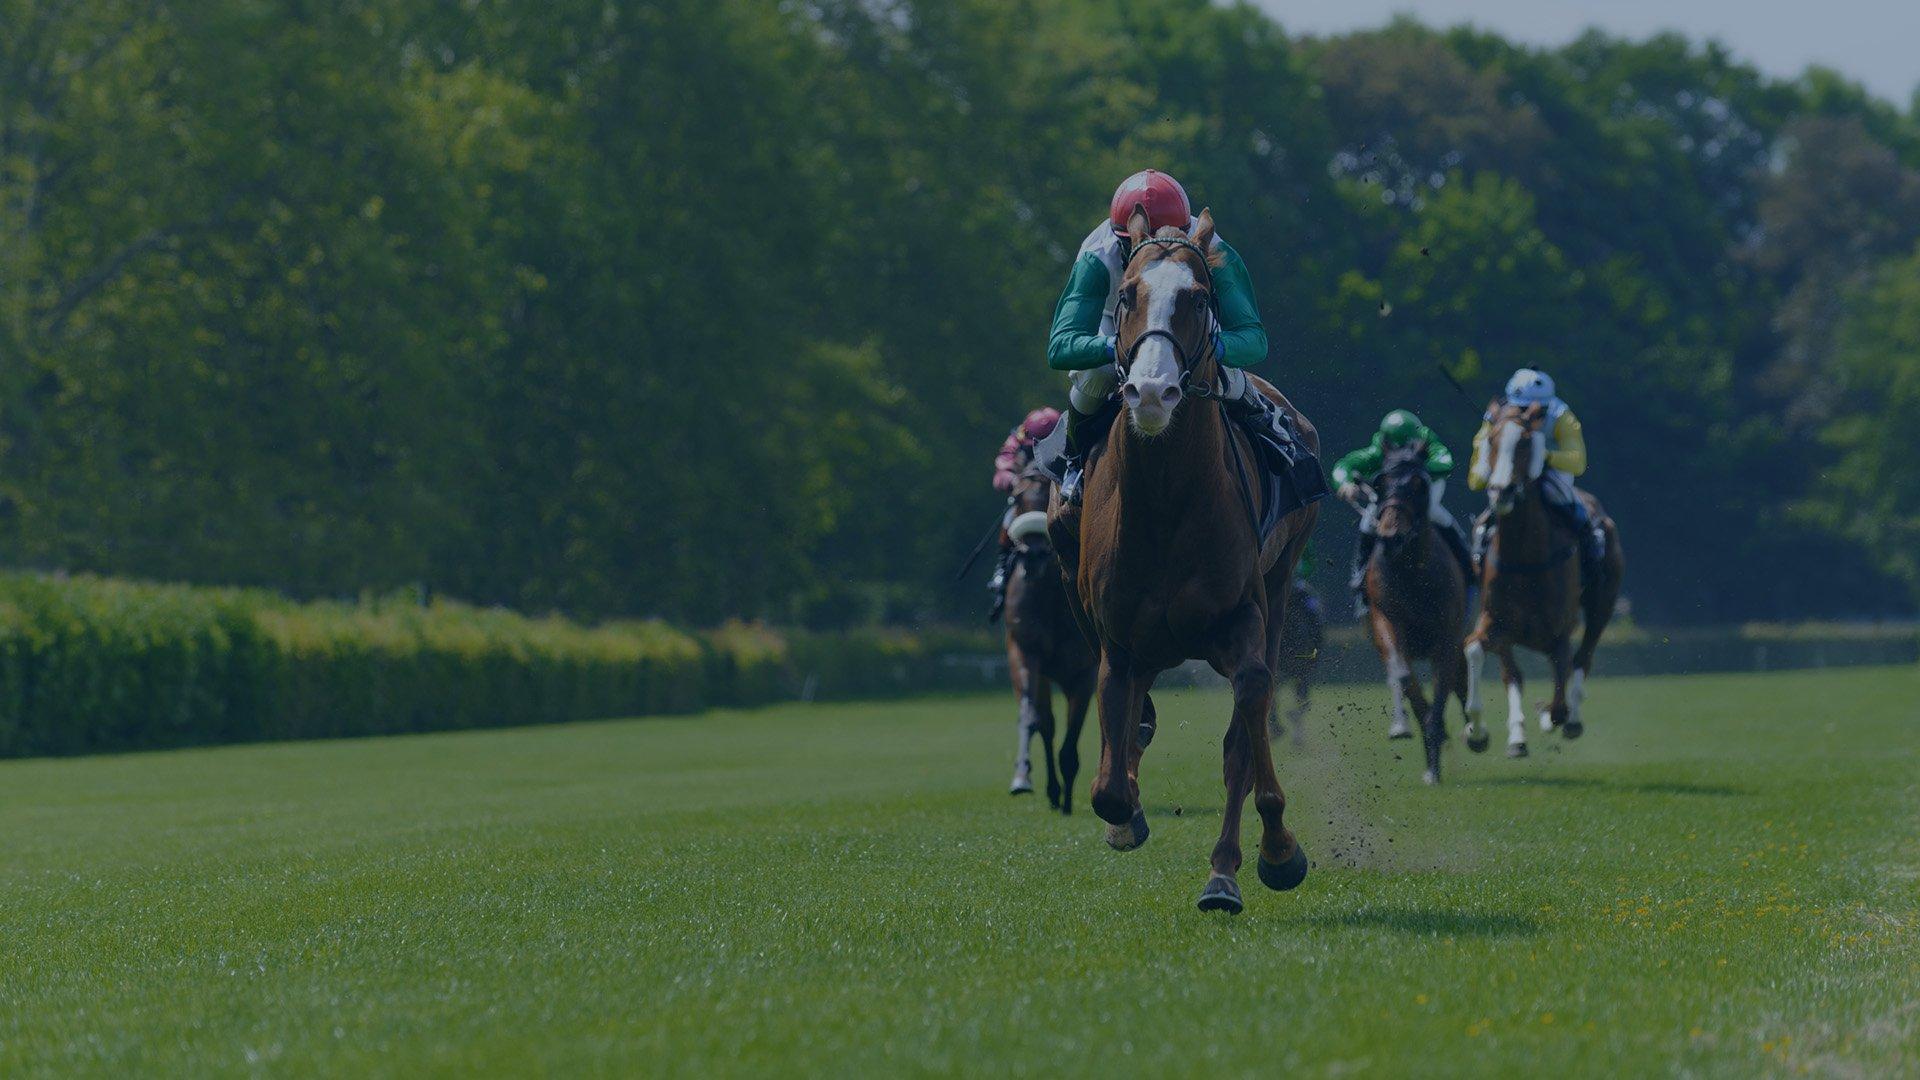 Jockey Winning Horse Race